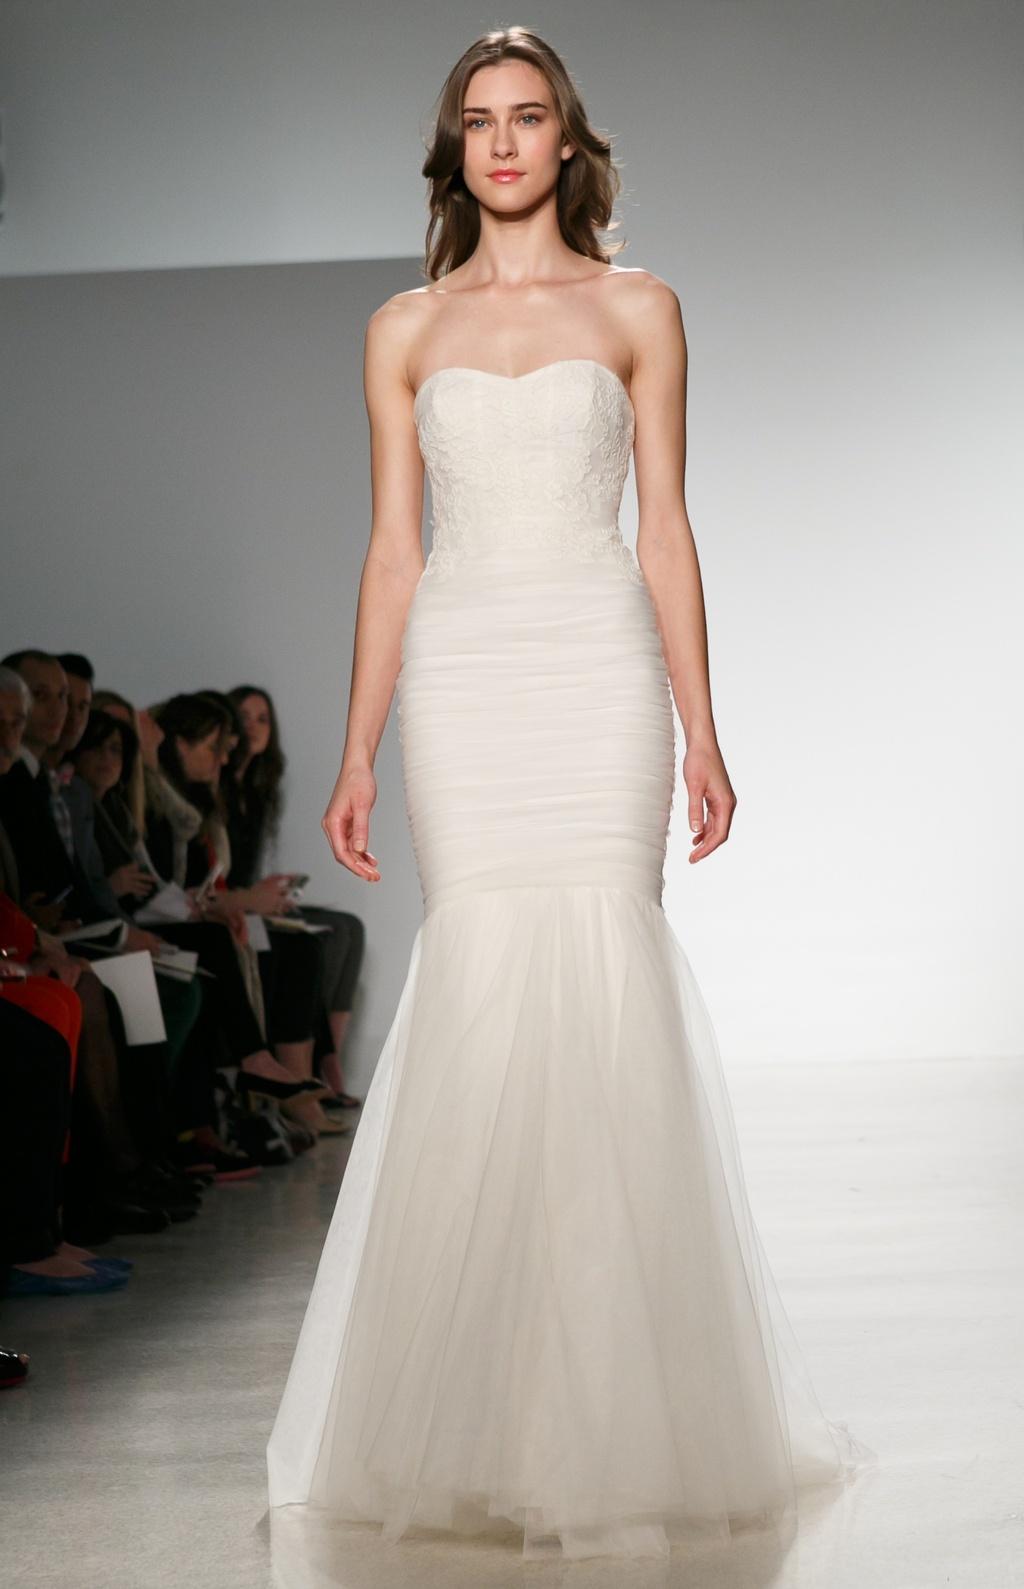 Christos-wedding-dress-spring-2014-bridal-6.full